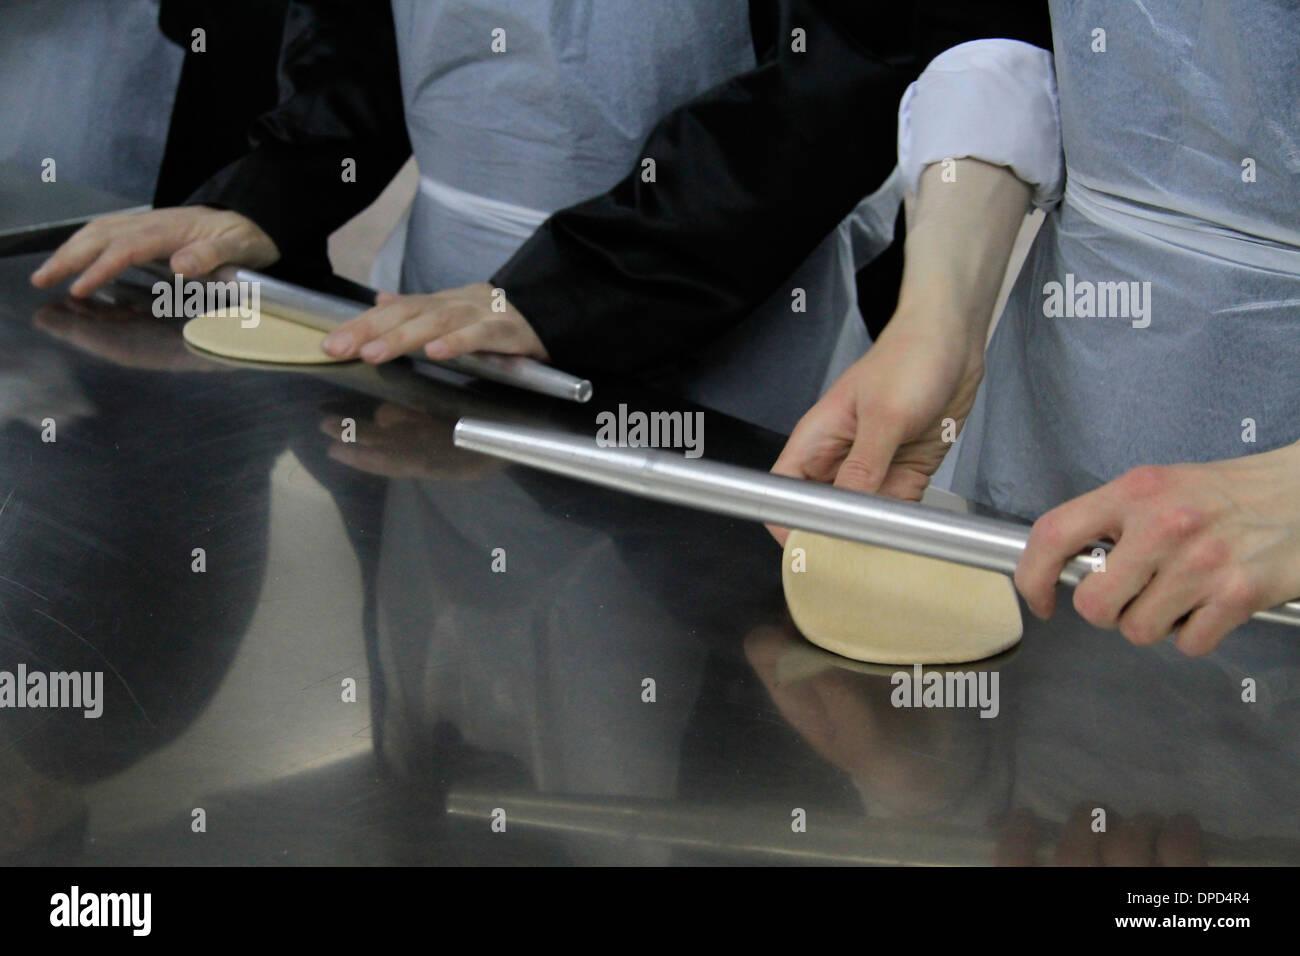 Matzah making ahead of the Seder meal at the Hasidic Premishlan congrgation, preparation of the dough - Stock Image